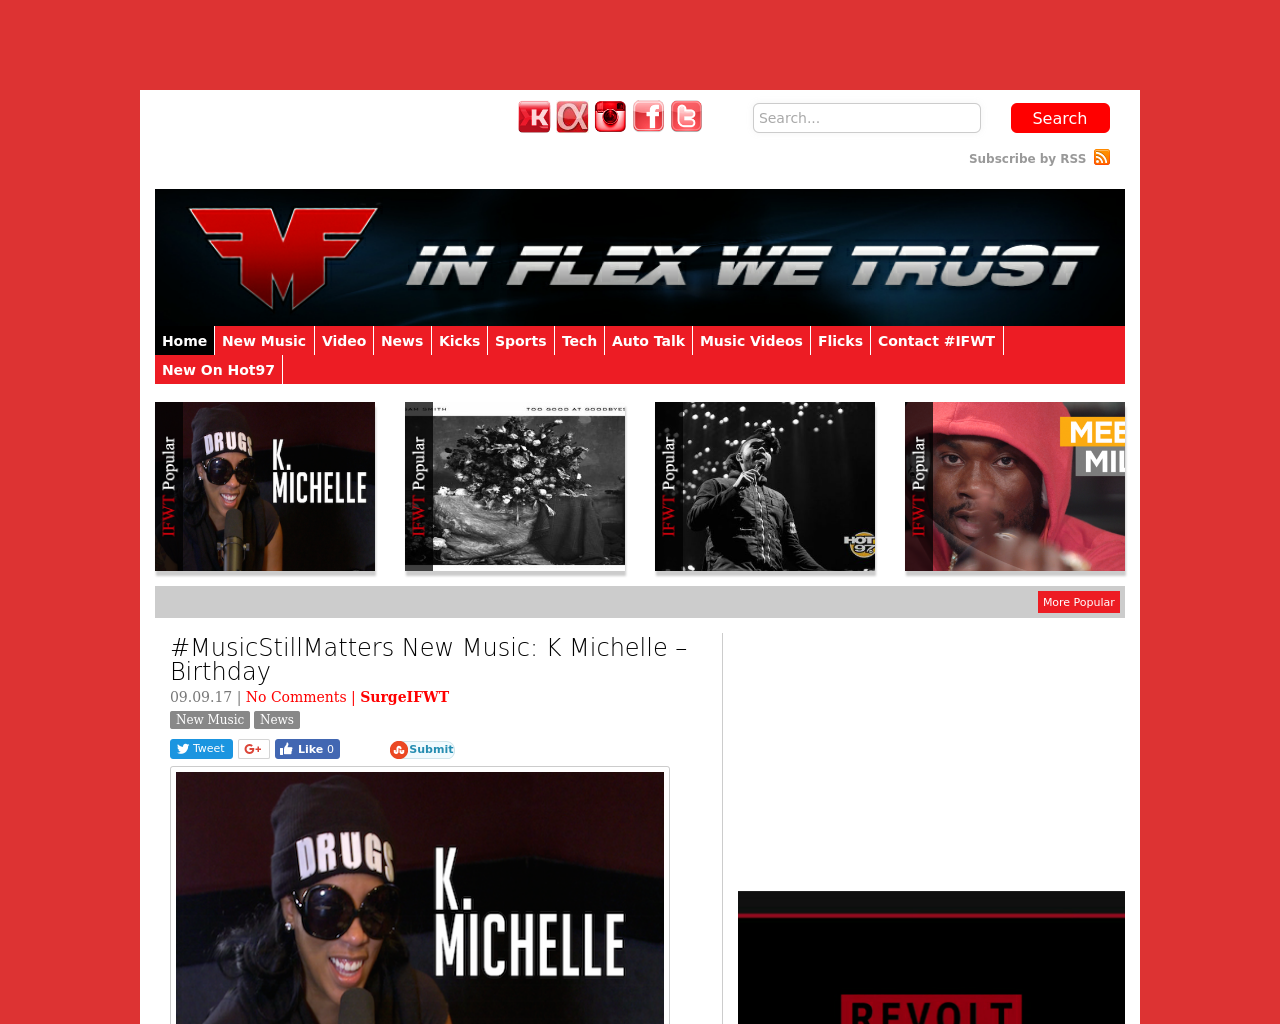 In-Flex-We-Trust-Advertising-Reviews-Pricing